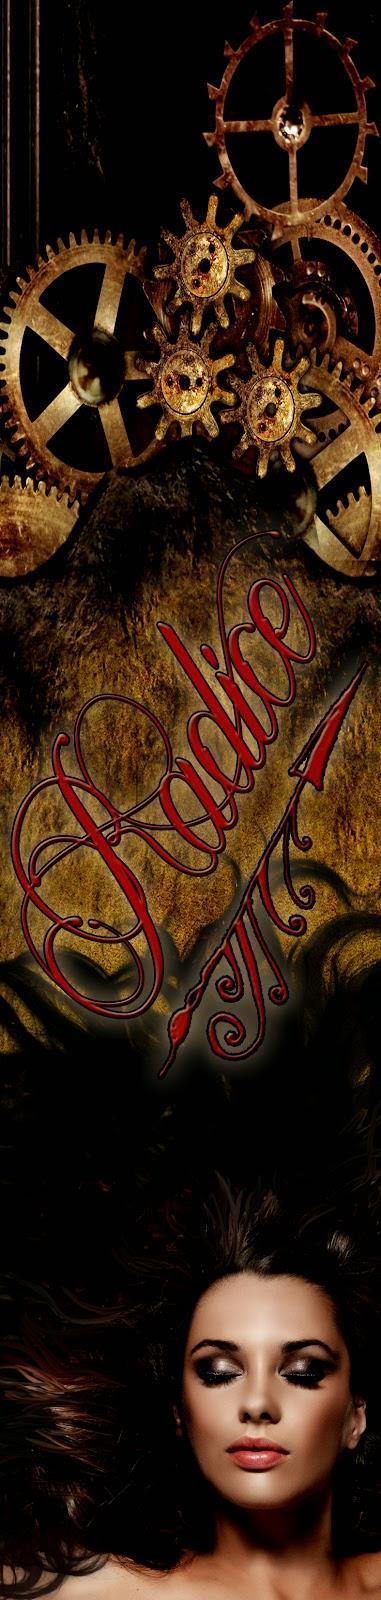 BlogTour: Radice